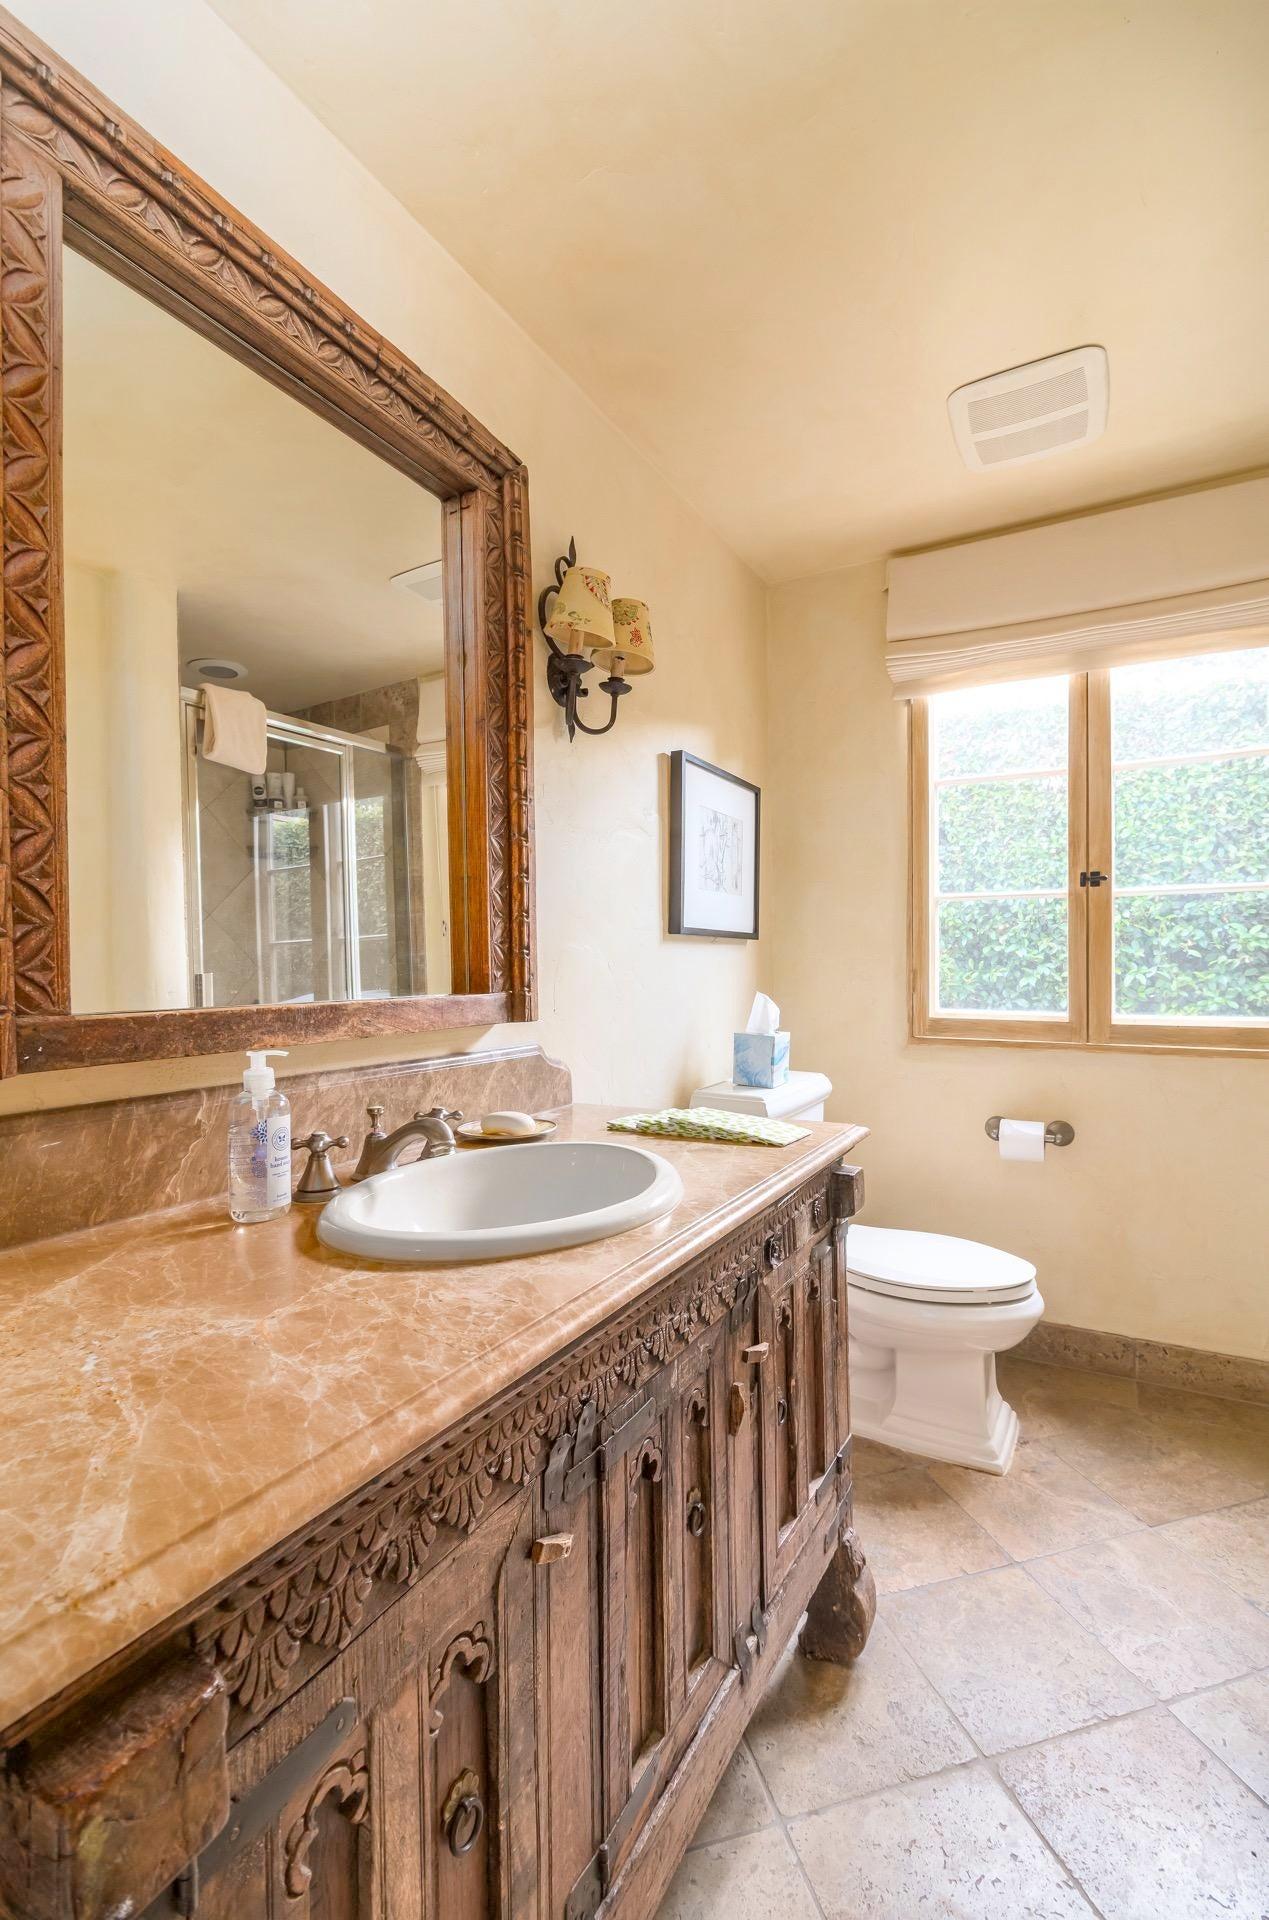 014 Guest bathroom